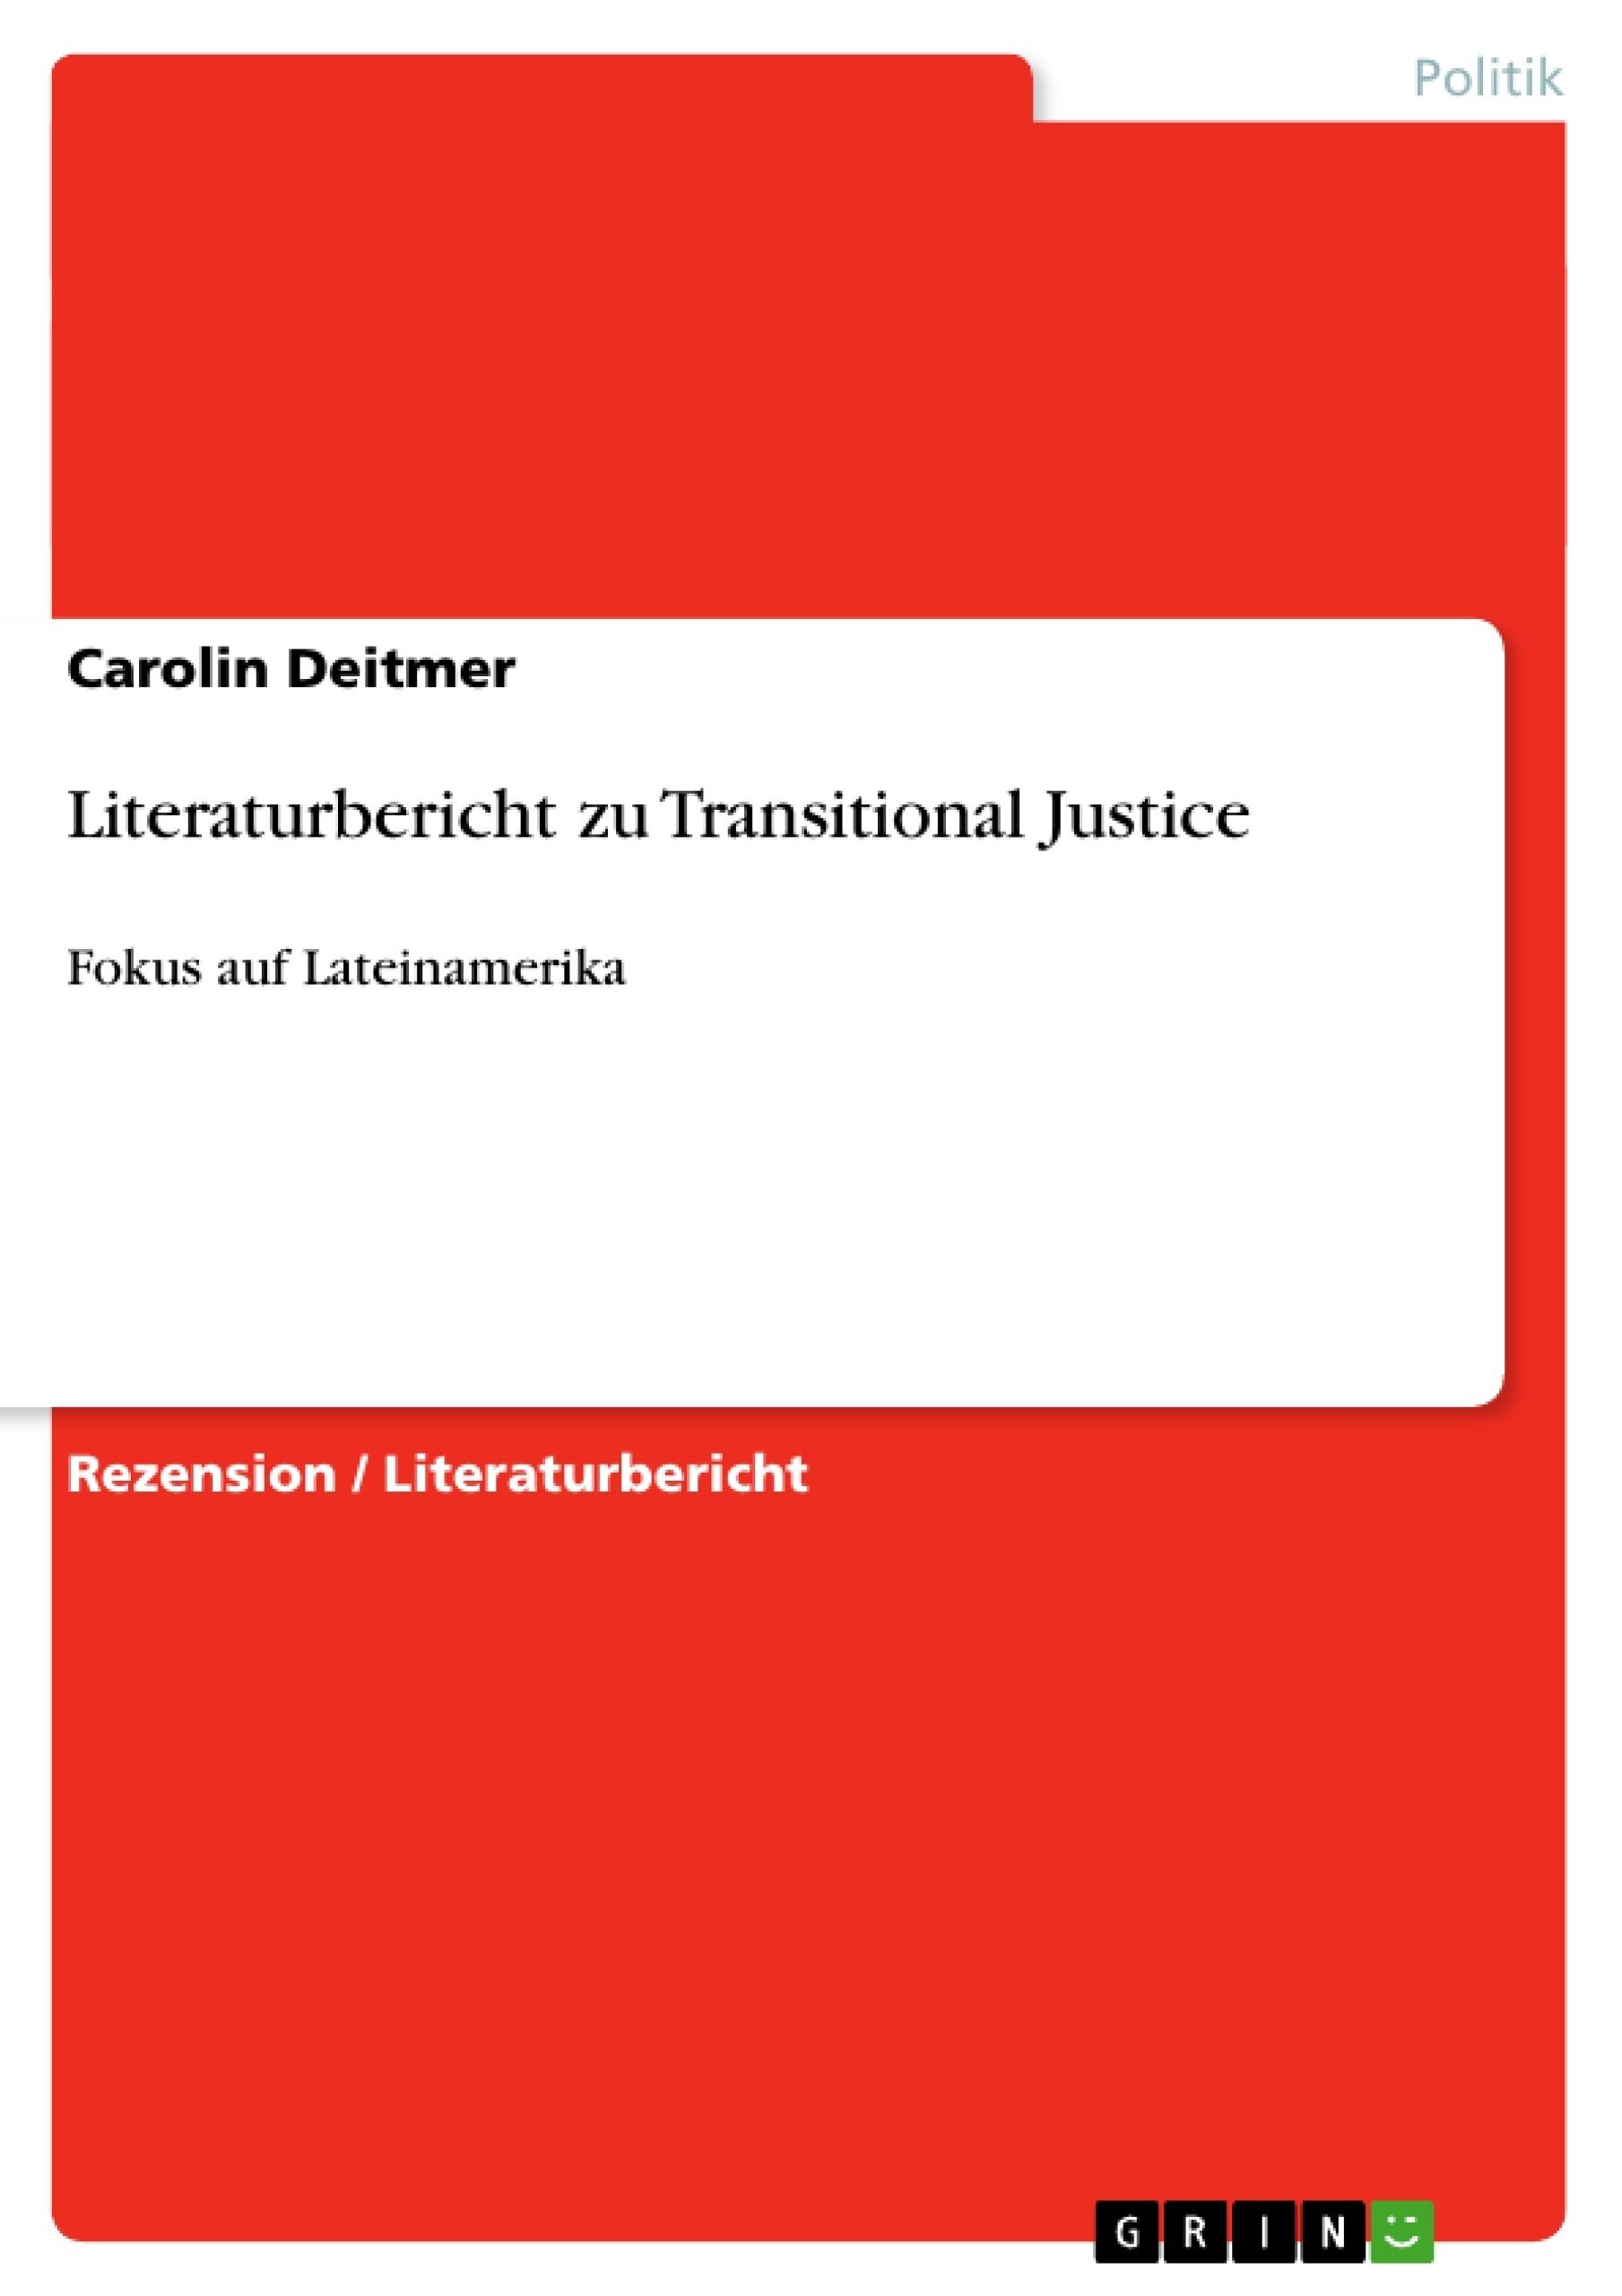 Titel: Literaturbericht zu Transitional Justice